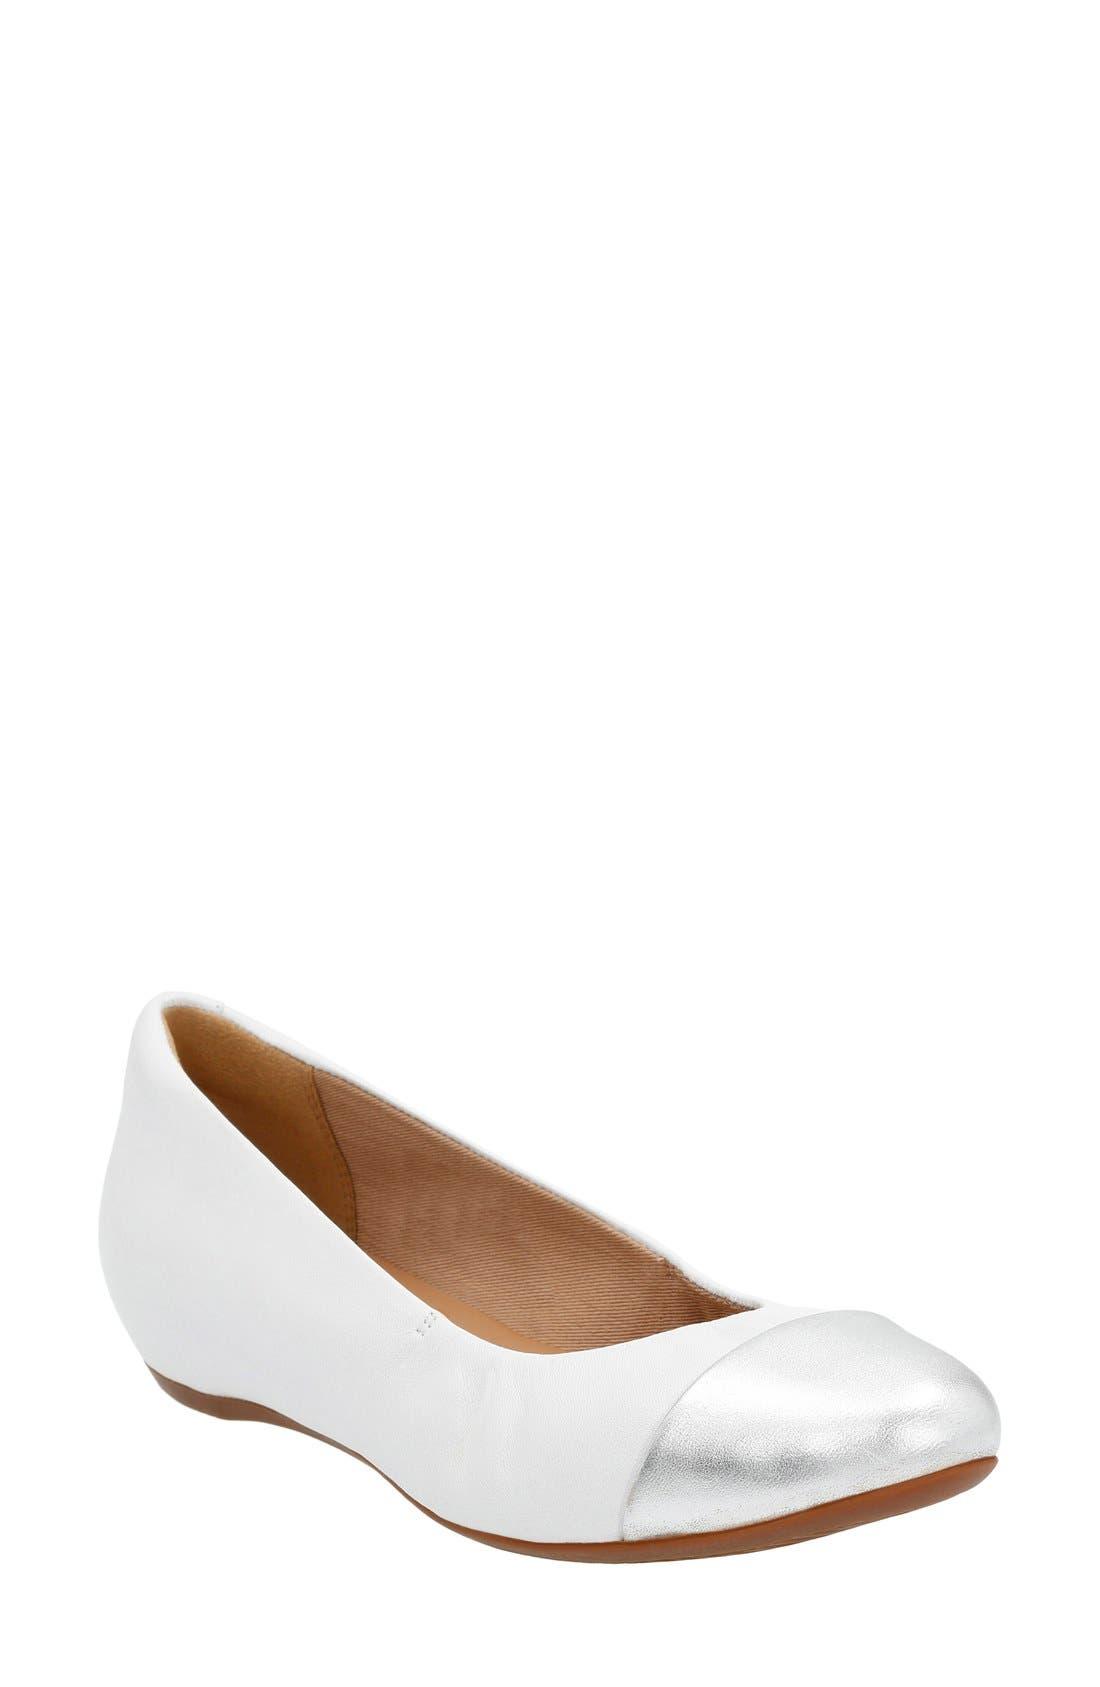 CLARKS<SUP>®</SUP> 'Alitay Susan' Cap Toe Flat, Main, color, 133